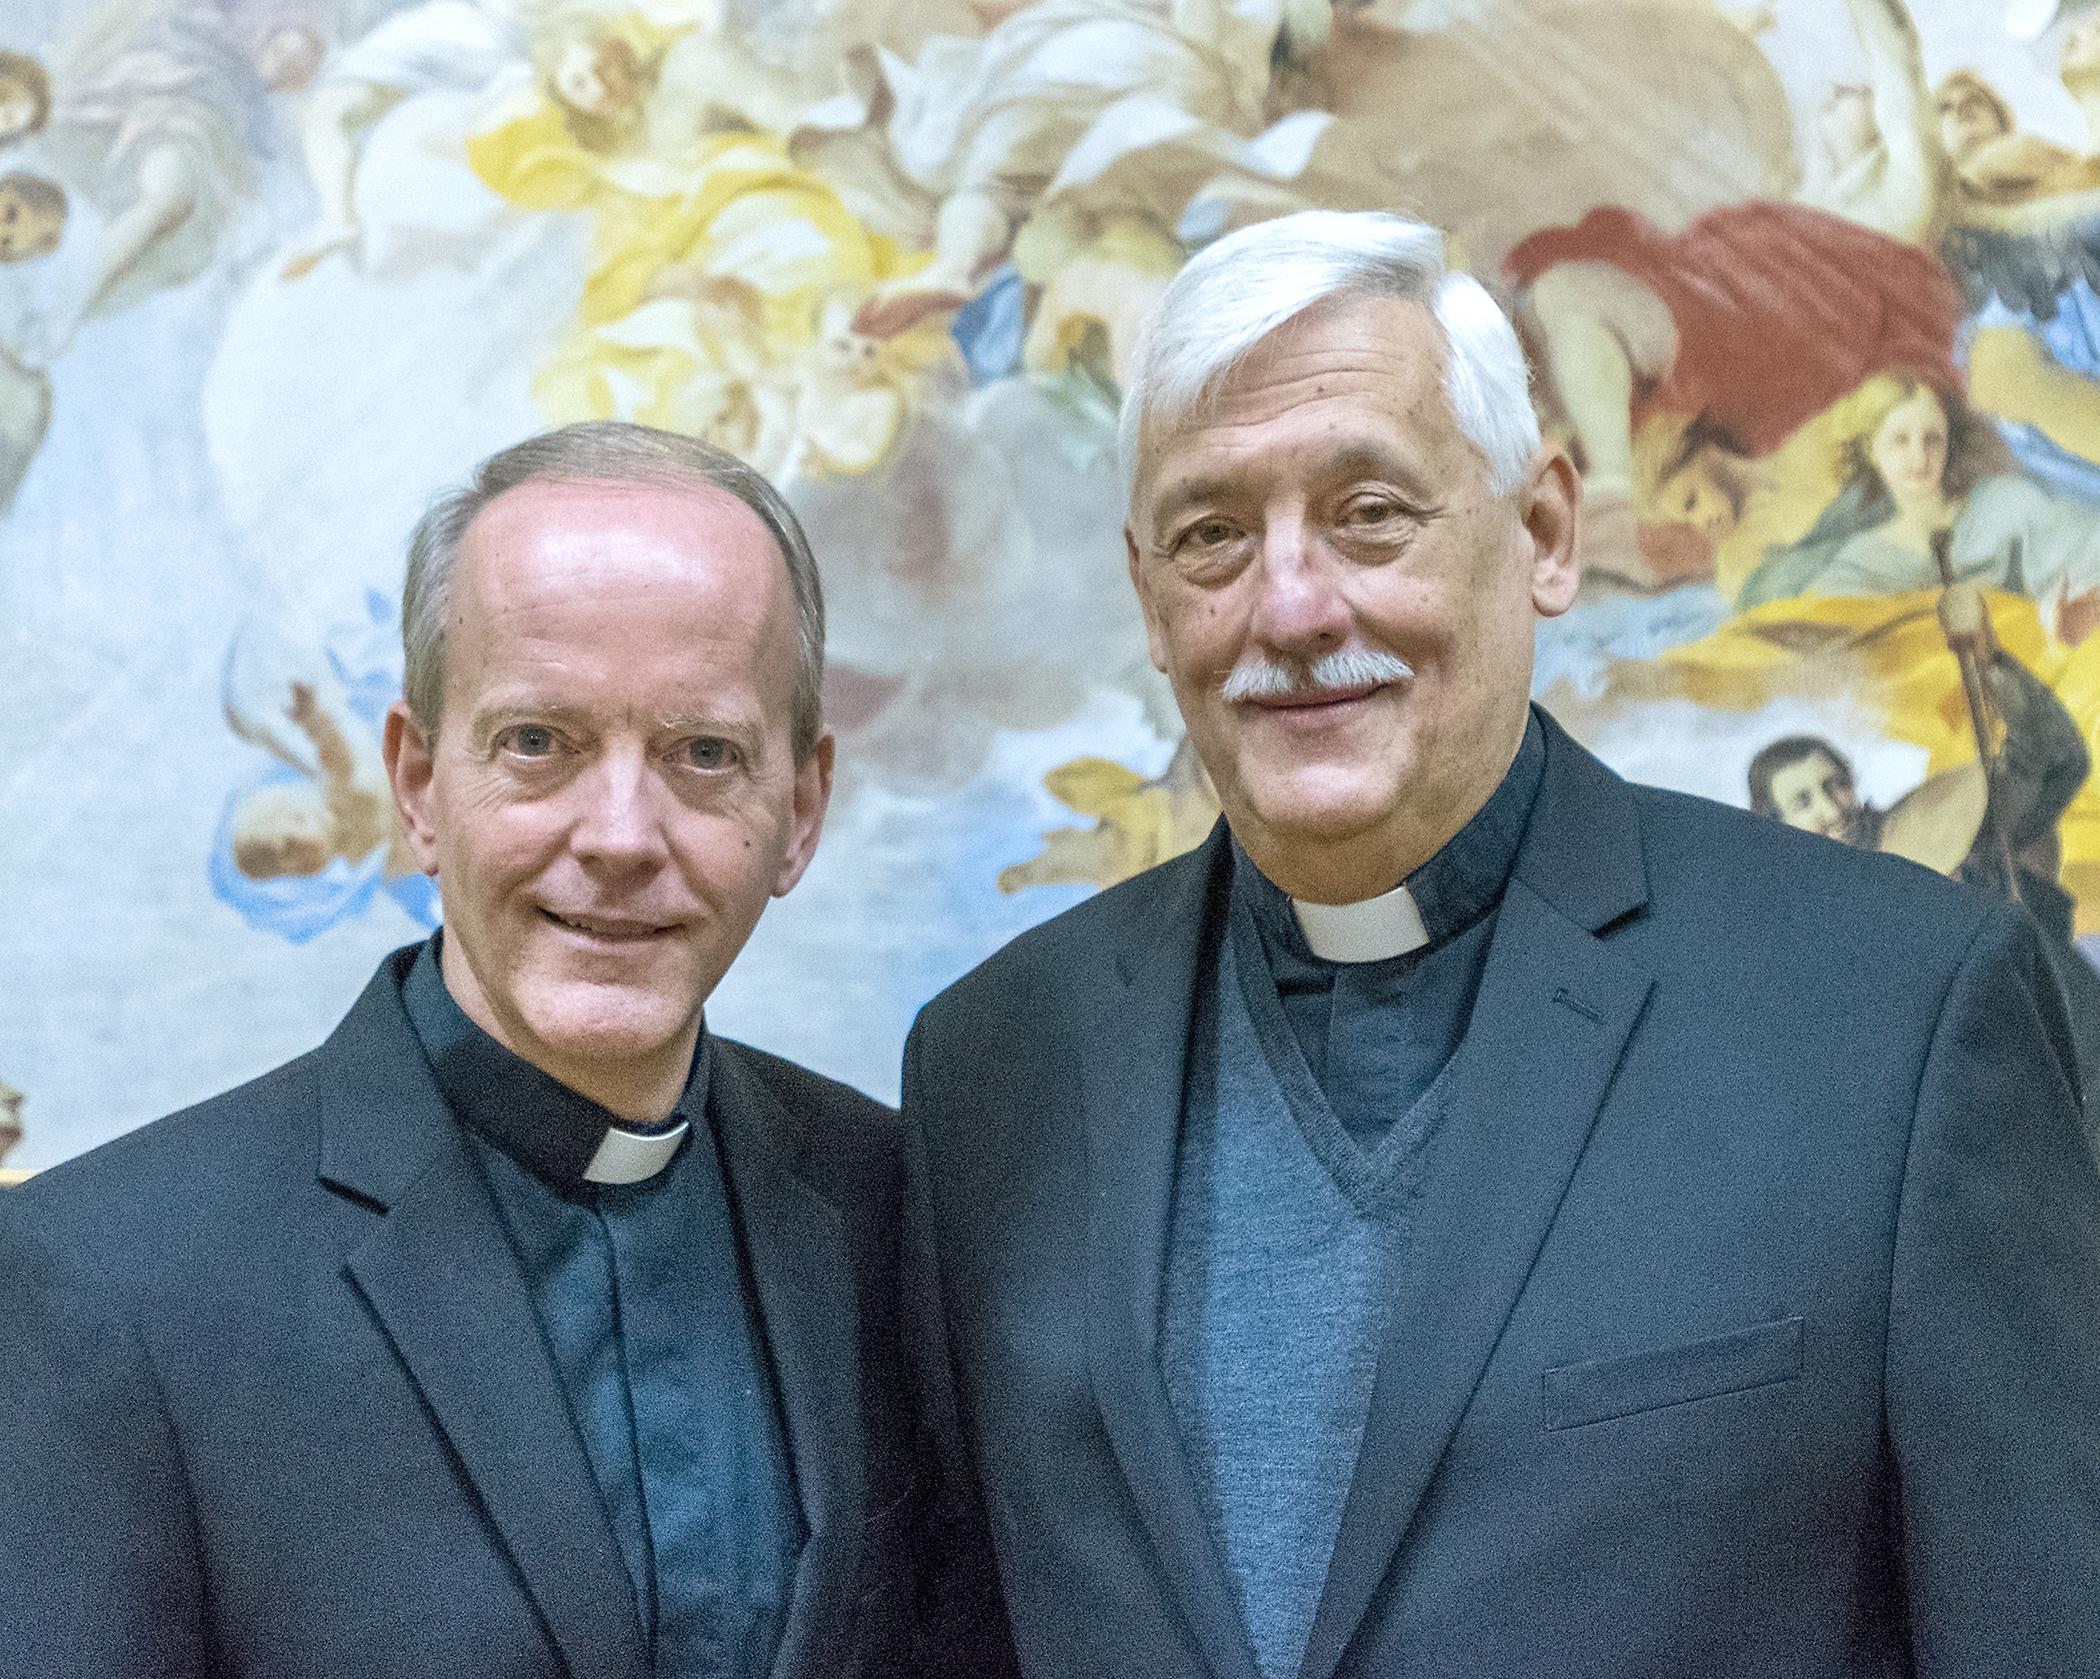 Very Rev. Robert M. Hussey, S.J. and Rev. Arturo Sosa, S.J. (Photo by Rev. Itua Egbor, S.J.)